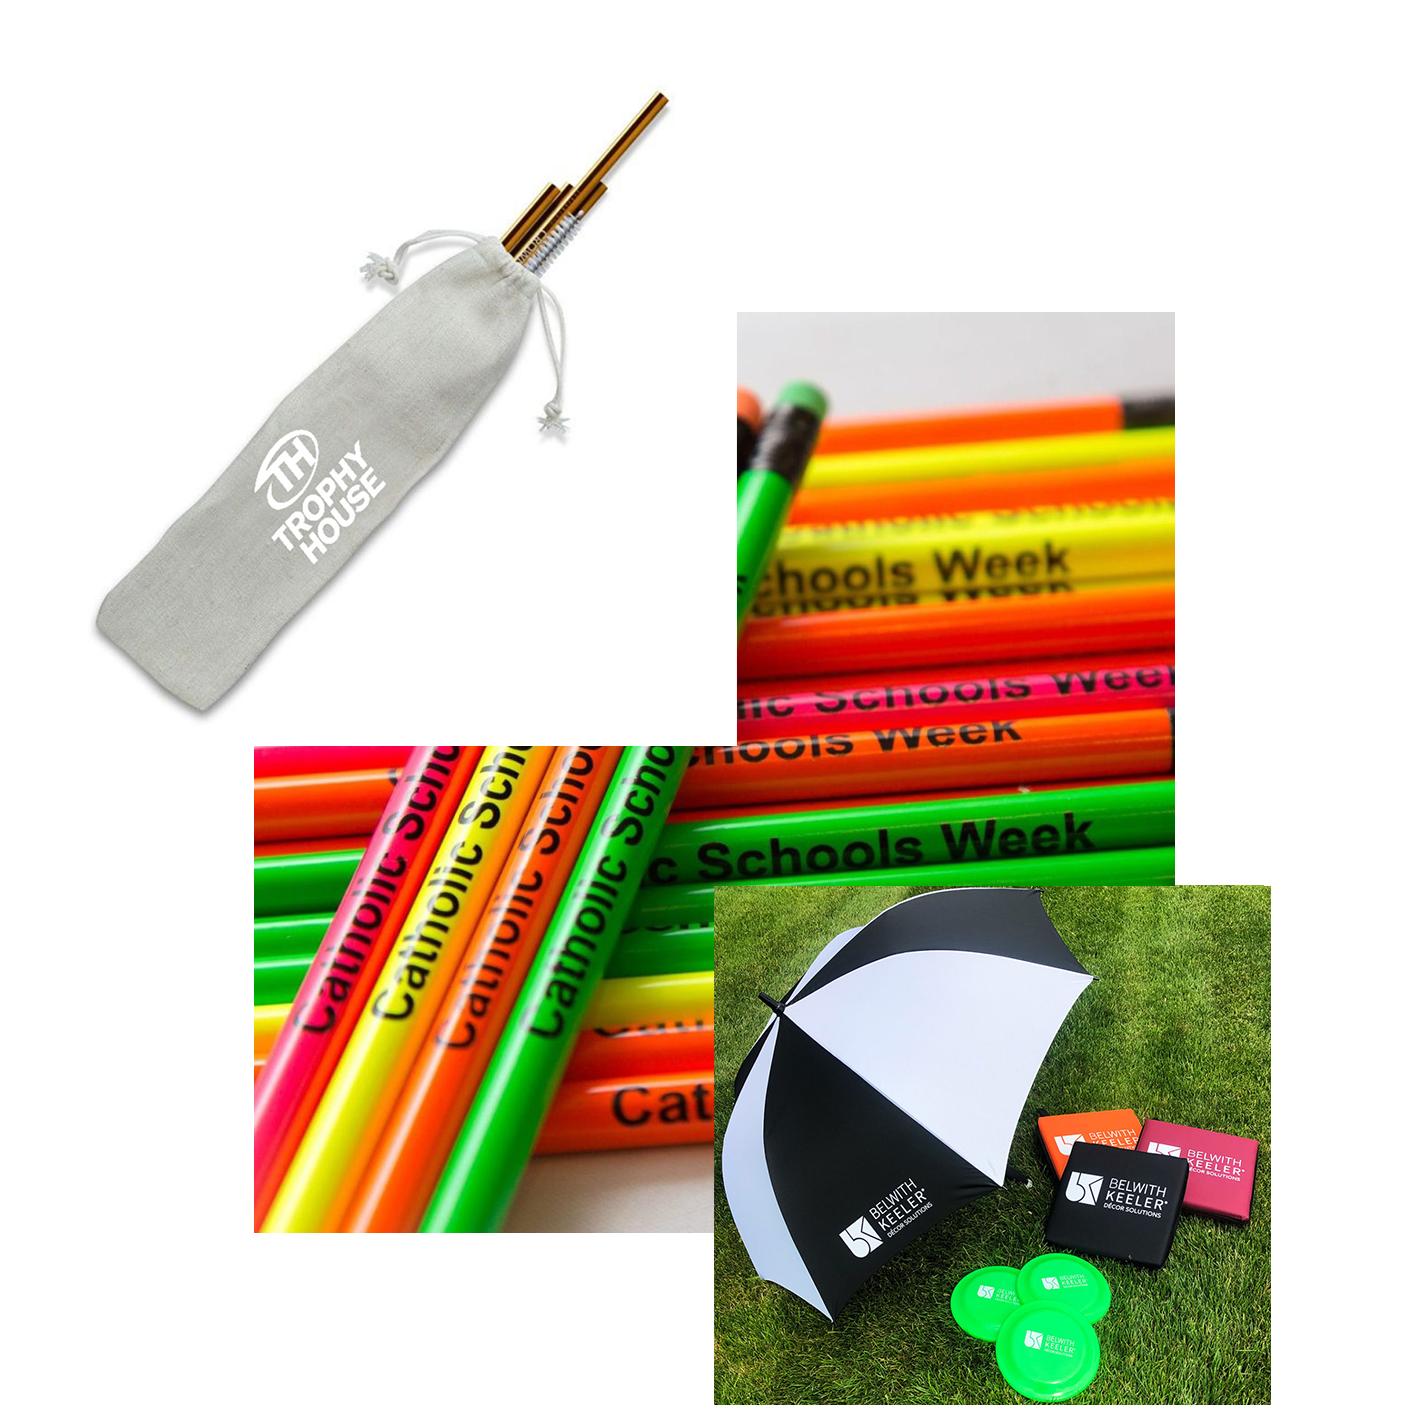 promo items collage